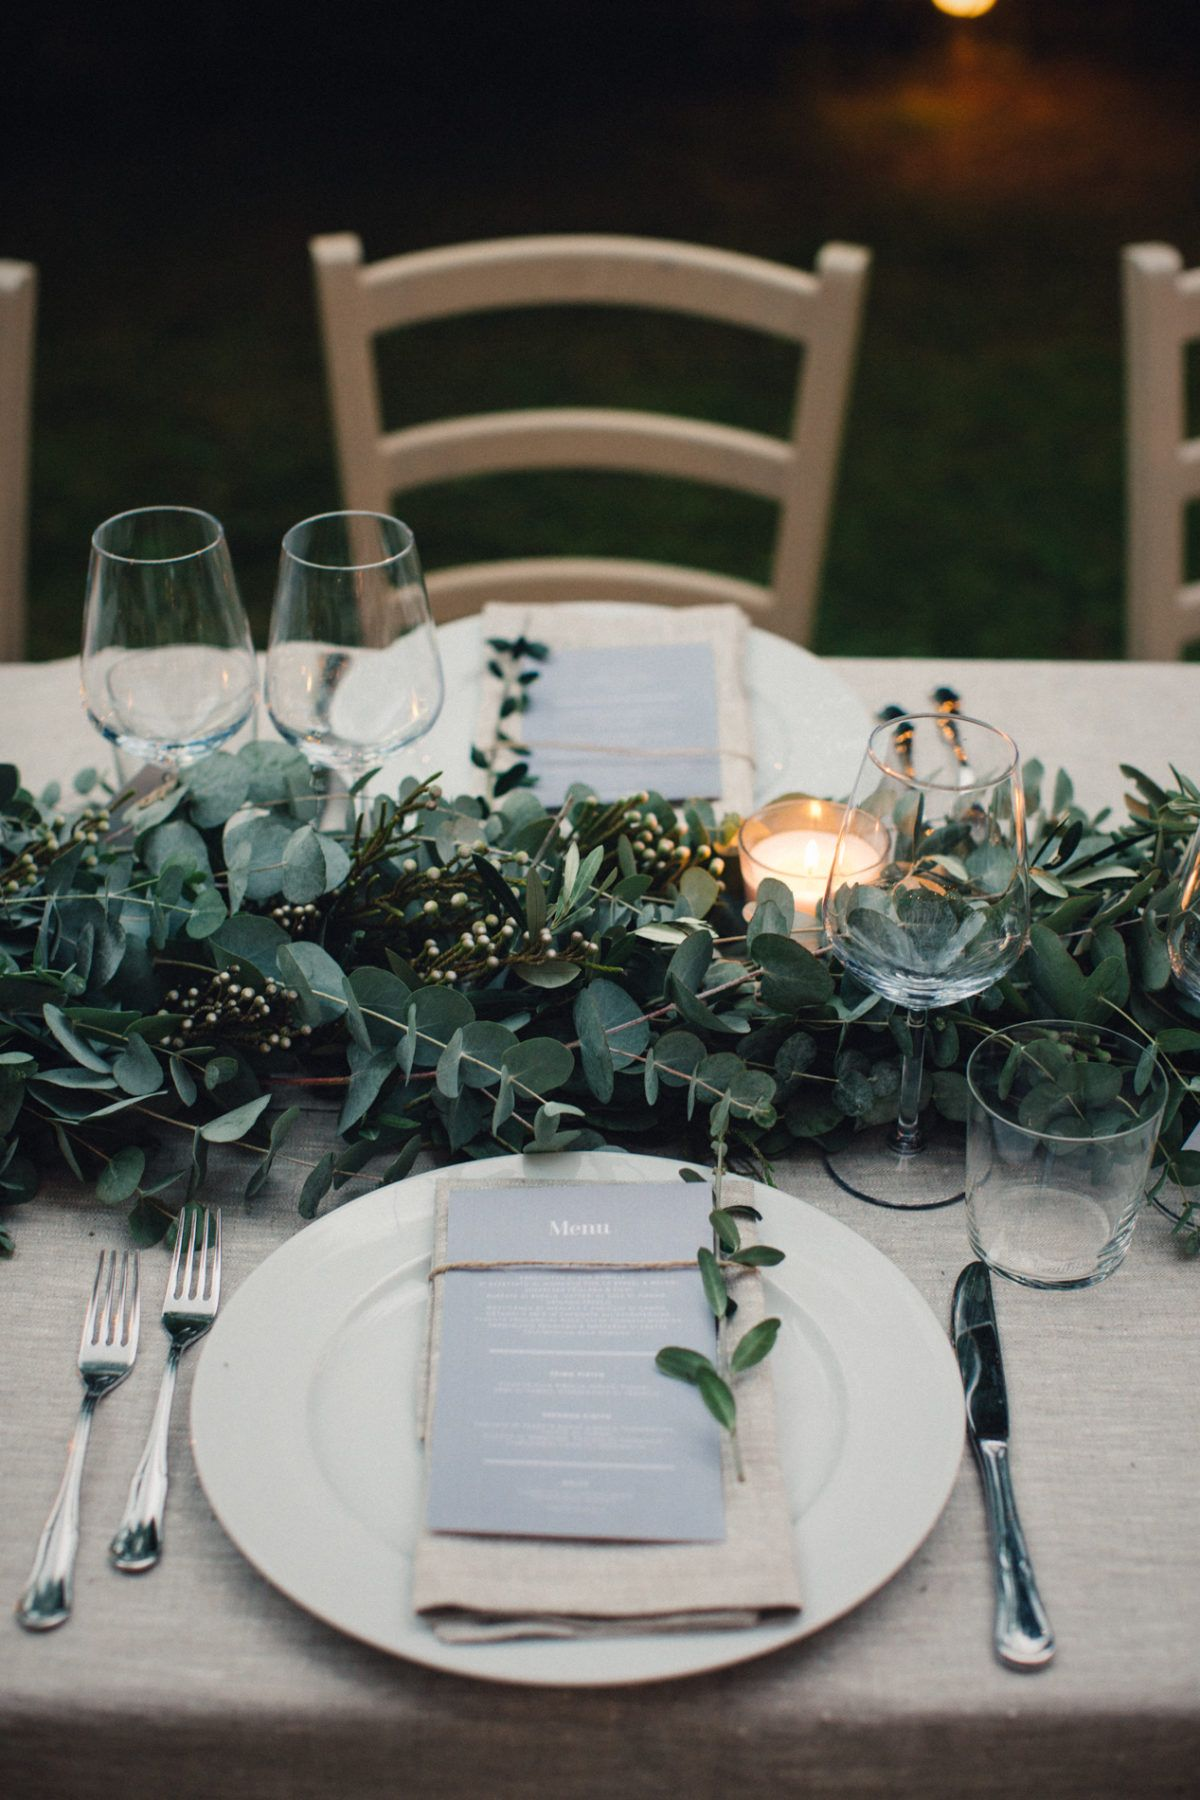 Late Autumn Destination Wedding in Italy